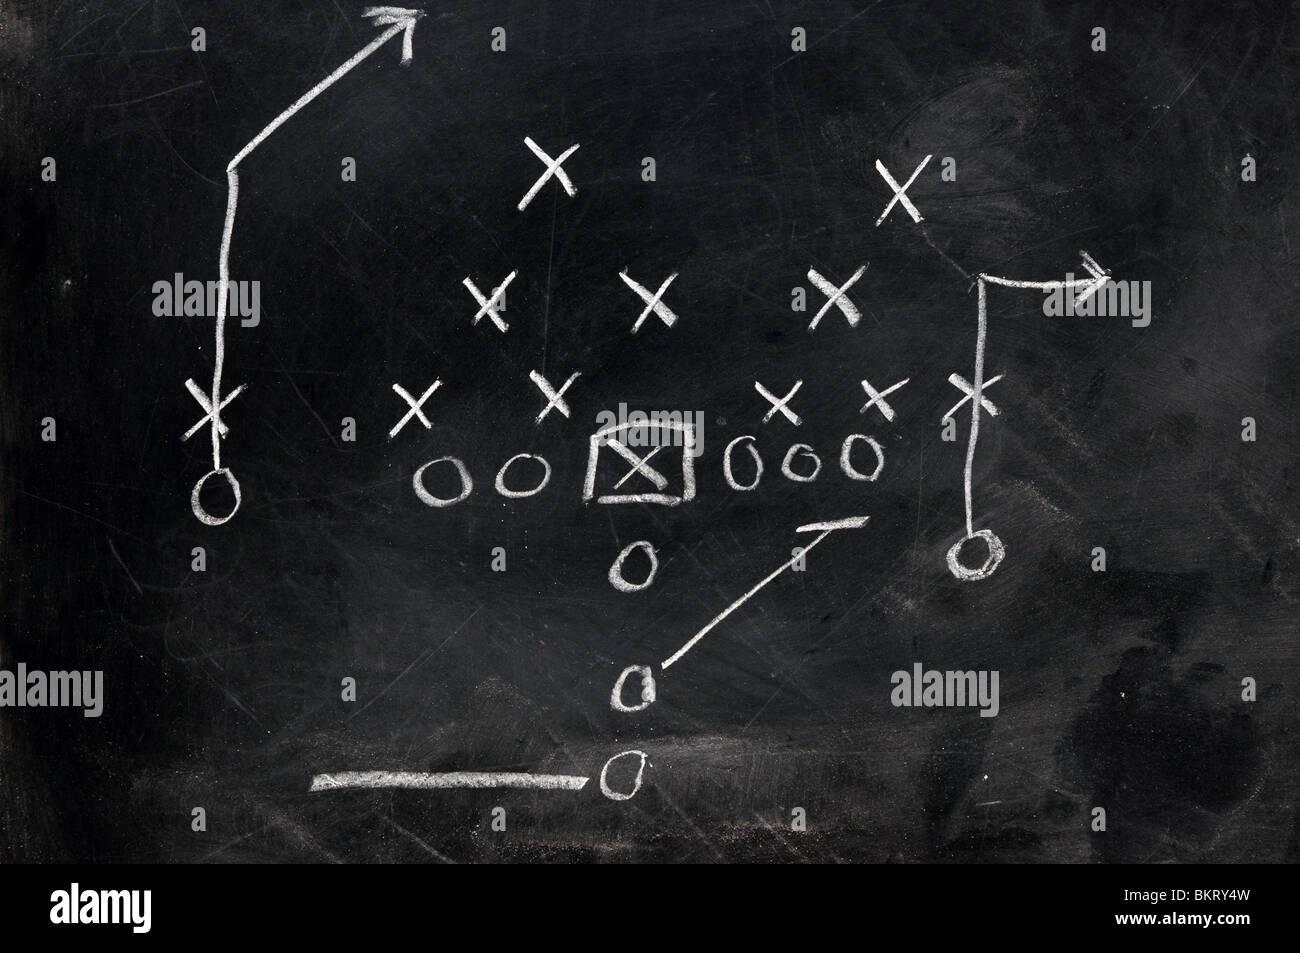 Diagram Of American Football Play On Black Chalkboard Stock Photo